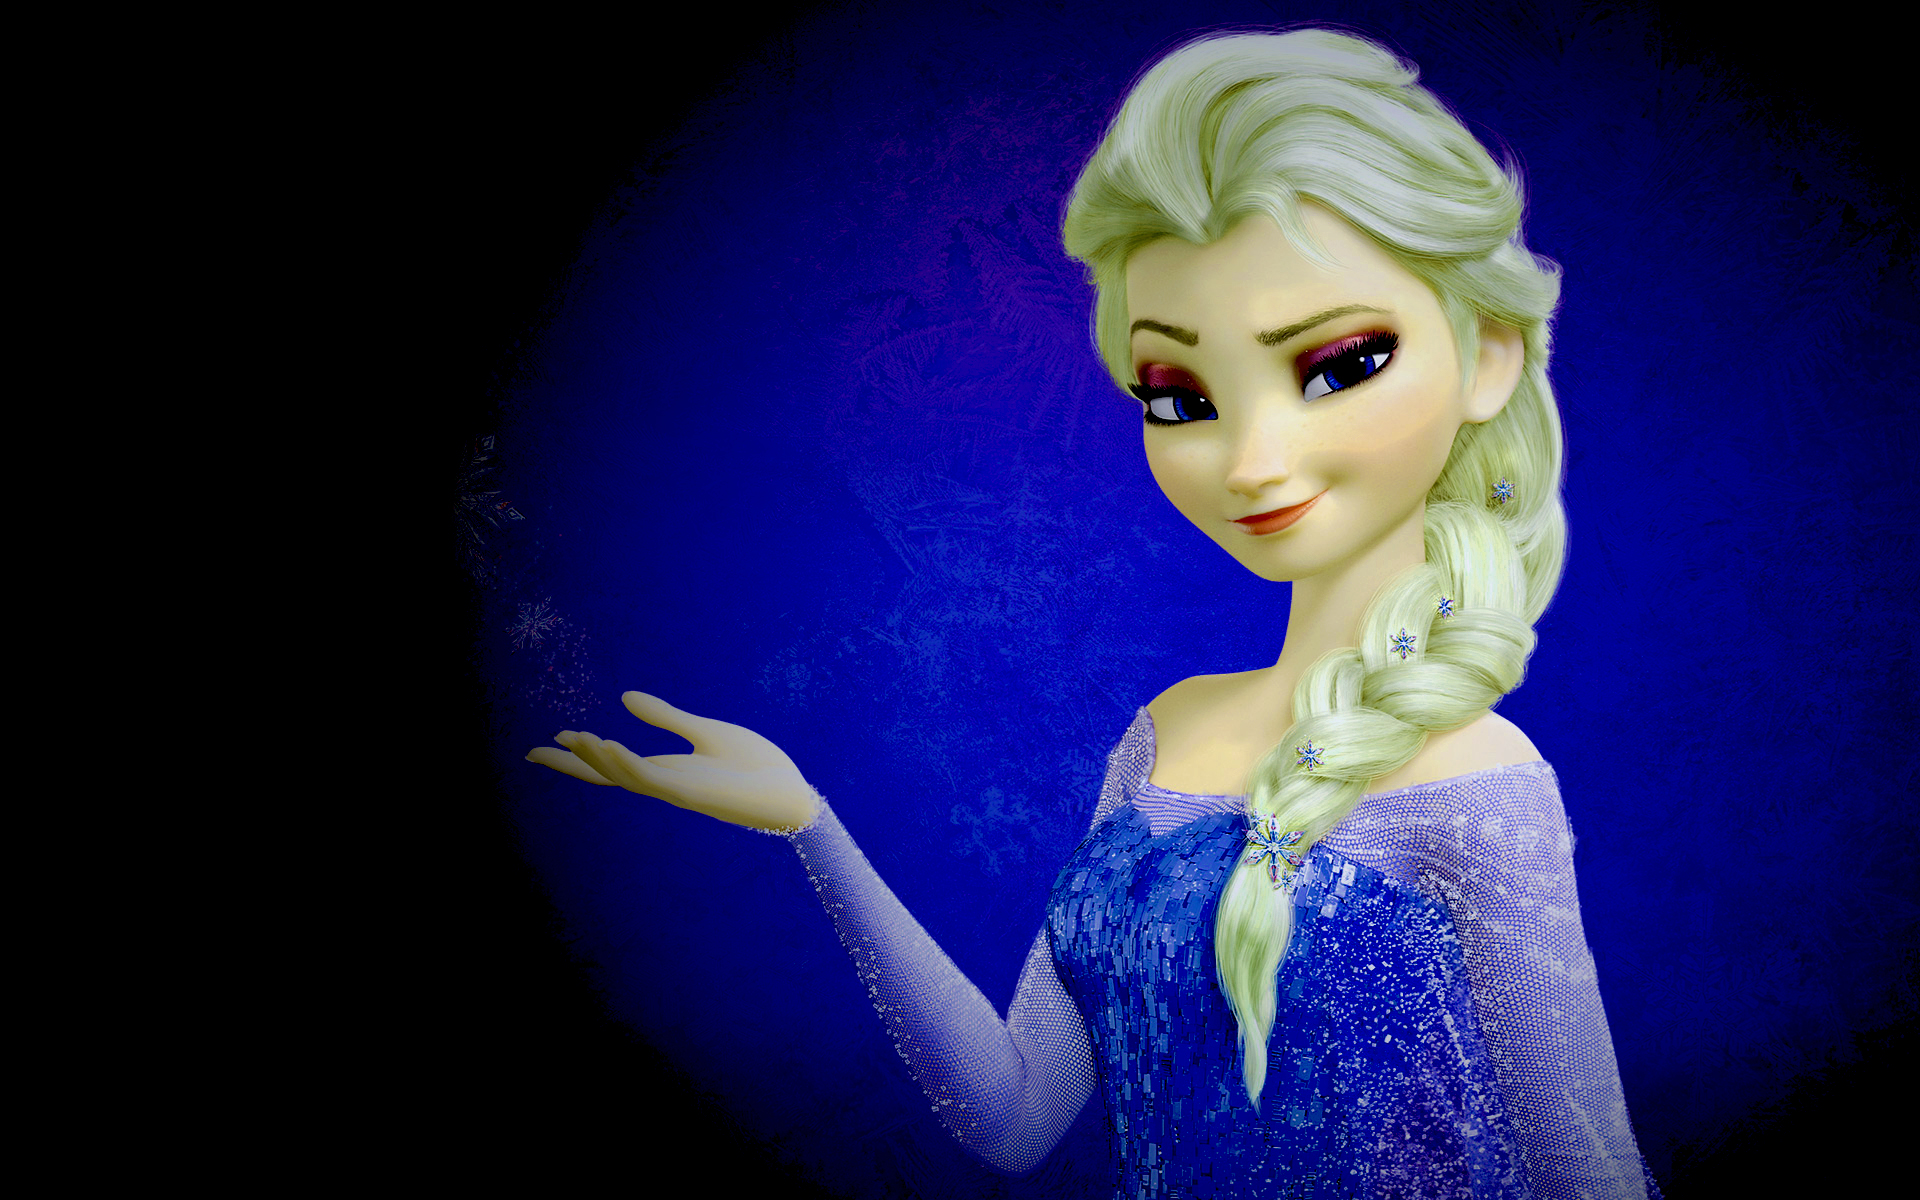 Frozen-Princess-Elsa-and-Anna-image-frozen-princess-elsa-and-anna ...